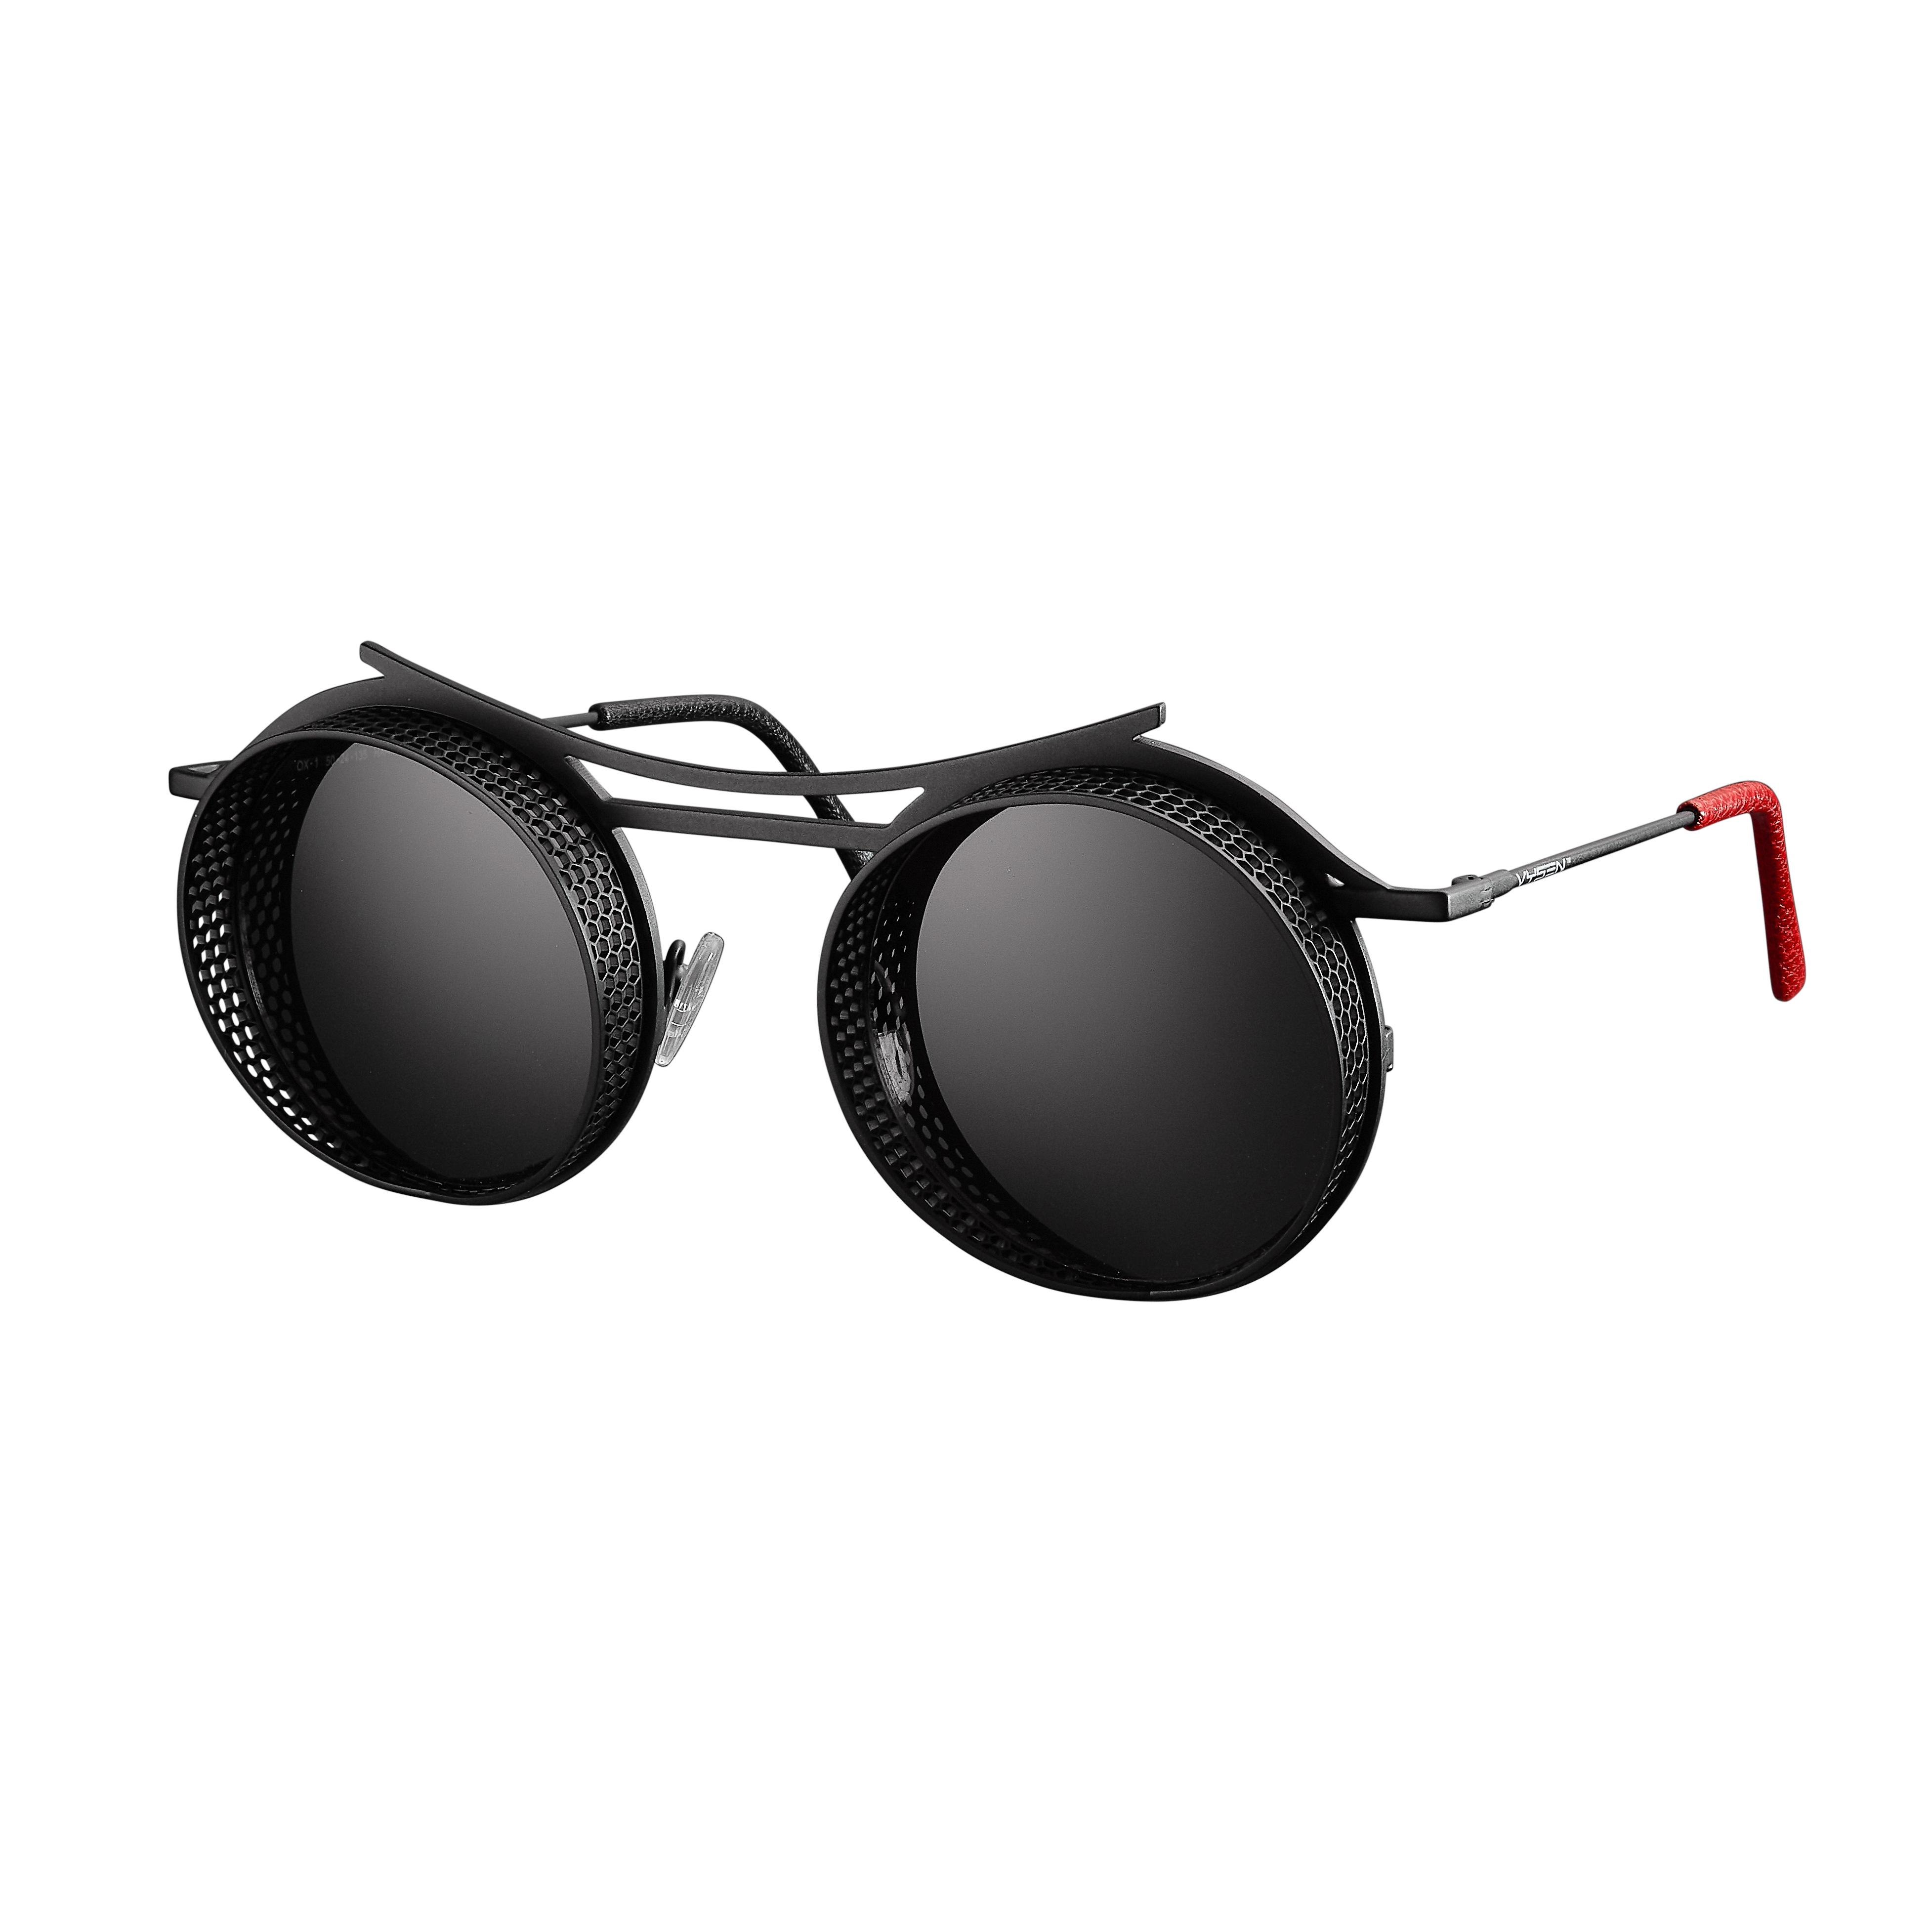 ONIX - OX - 1 - Black Matte Fame + Black Lenses